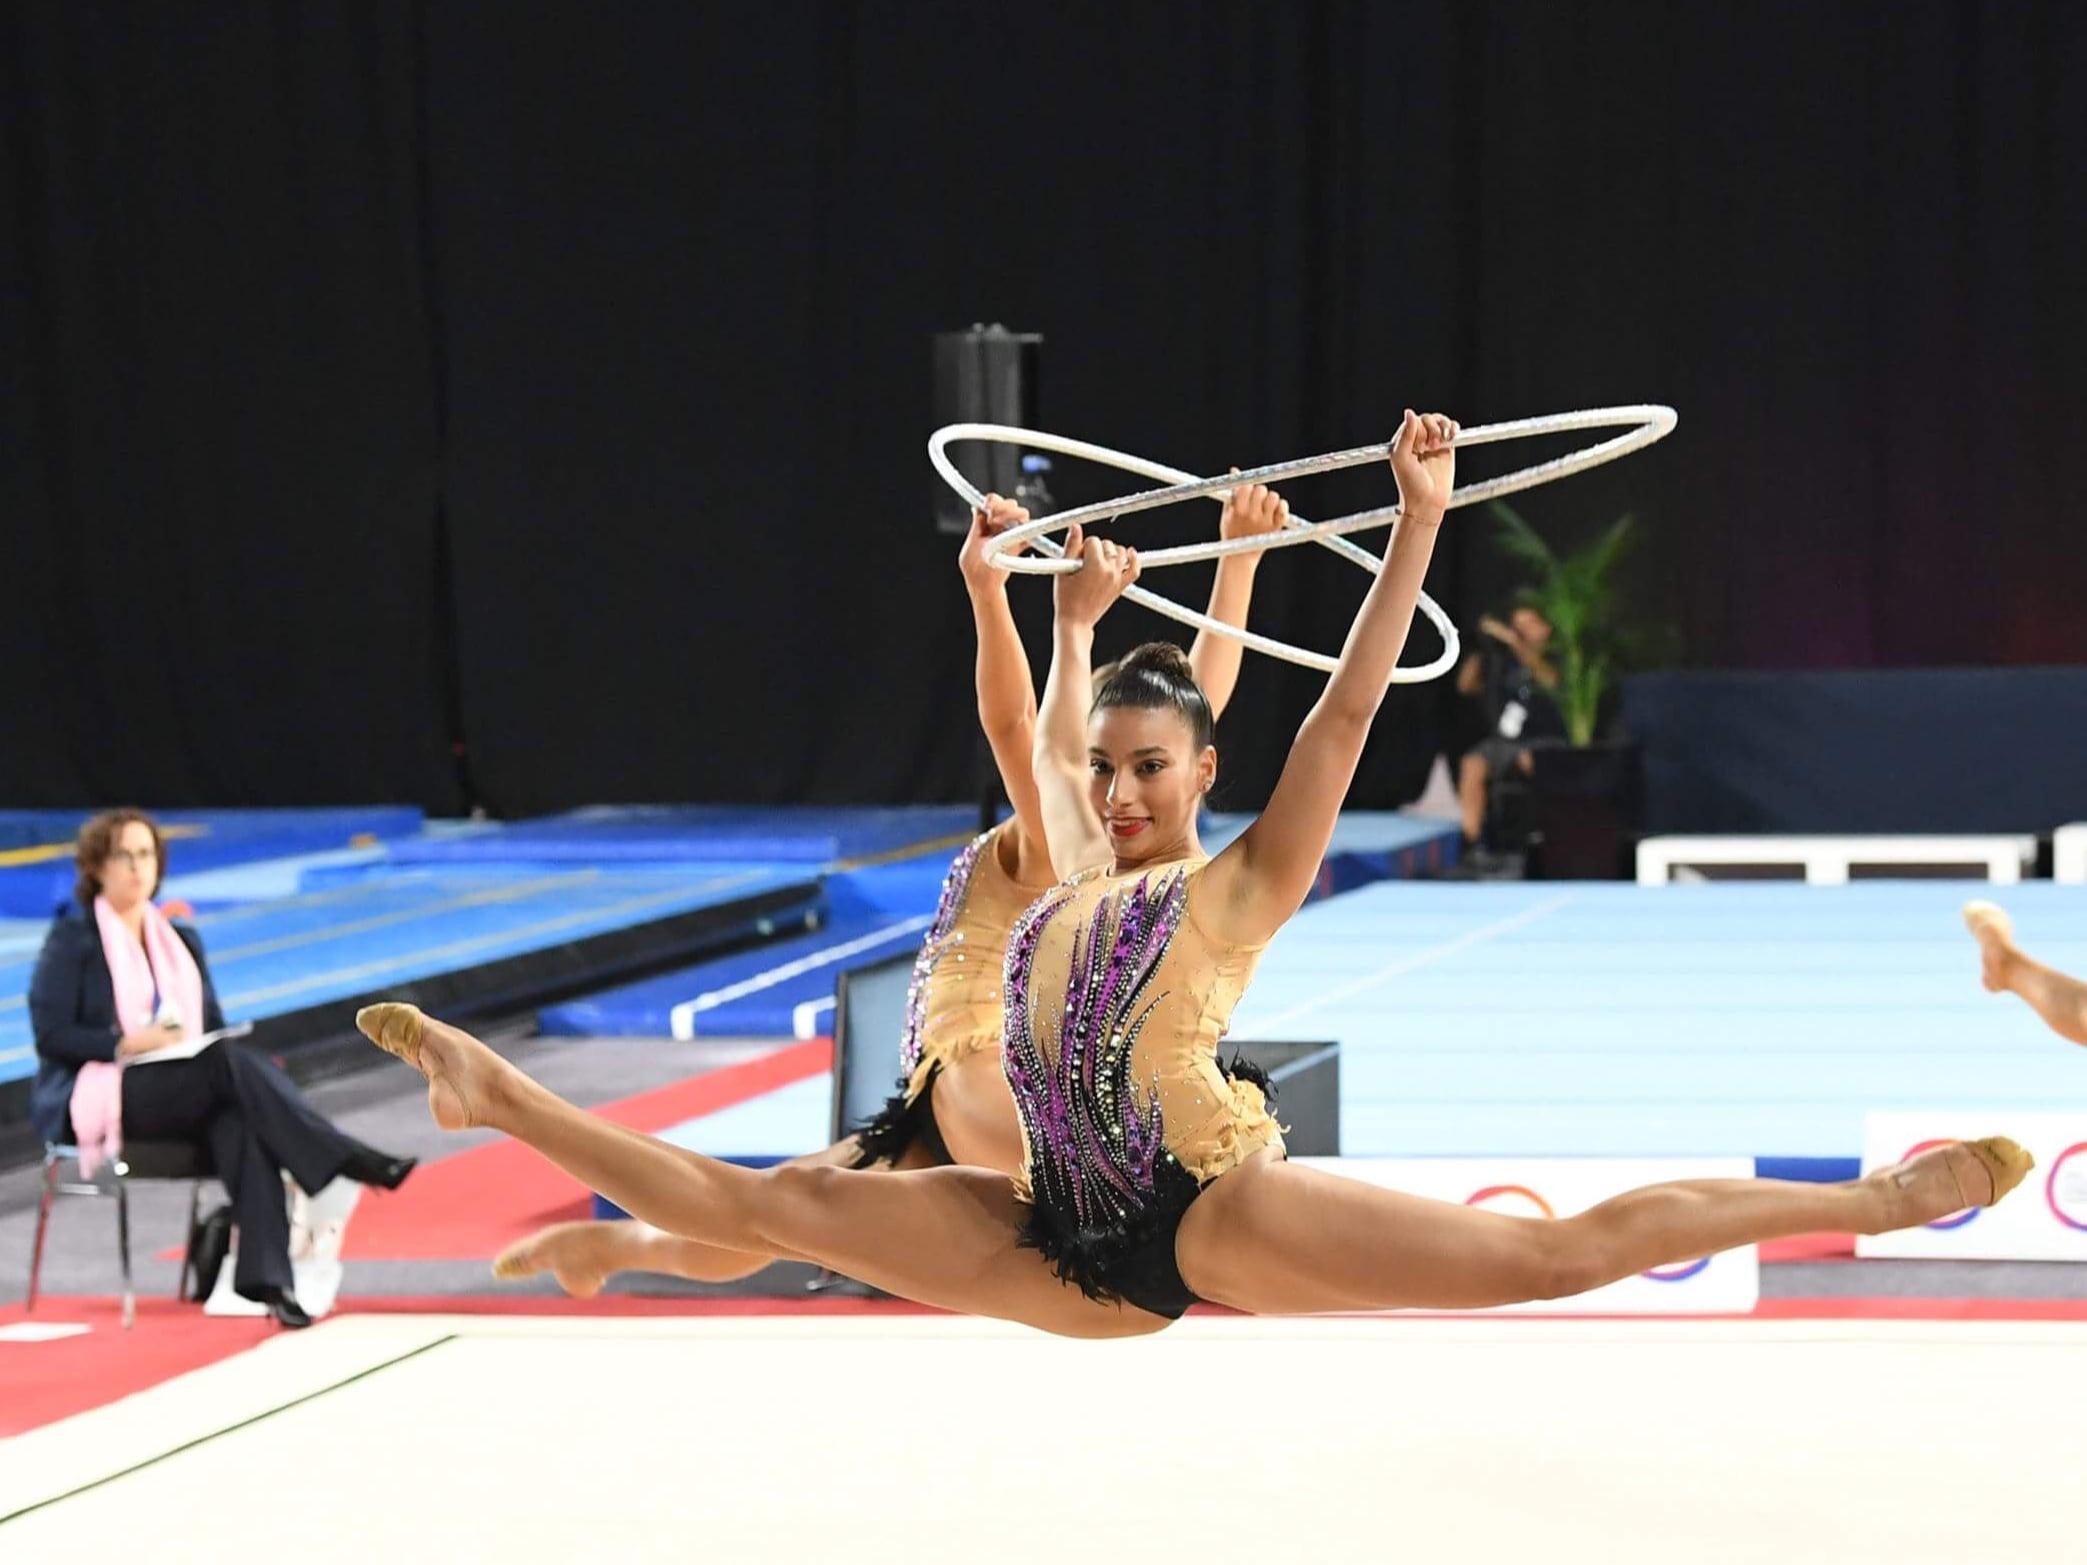 Alexandria Teixeira performs